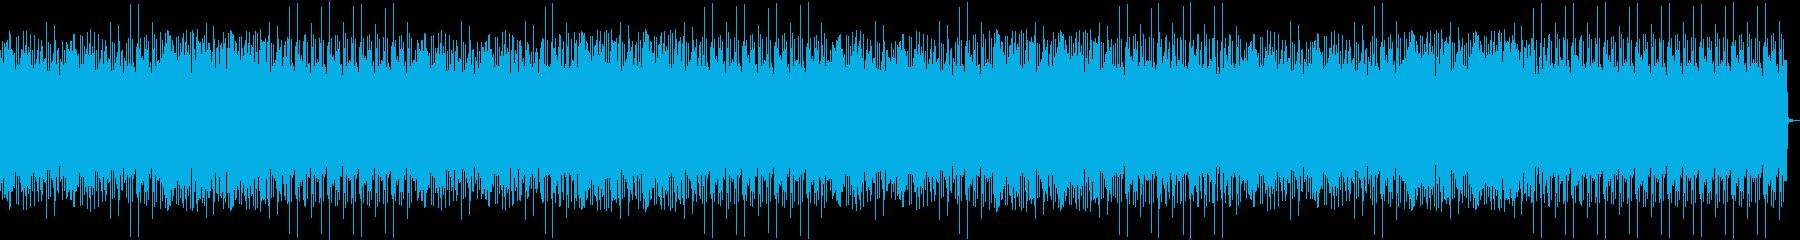 144bpm、F-Maj、16ビートの再生済みの波形